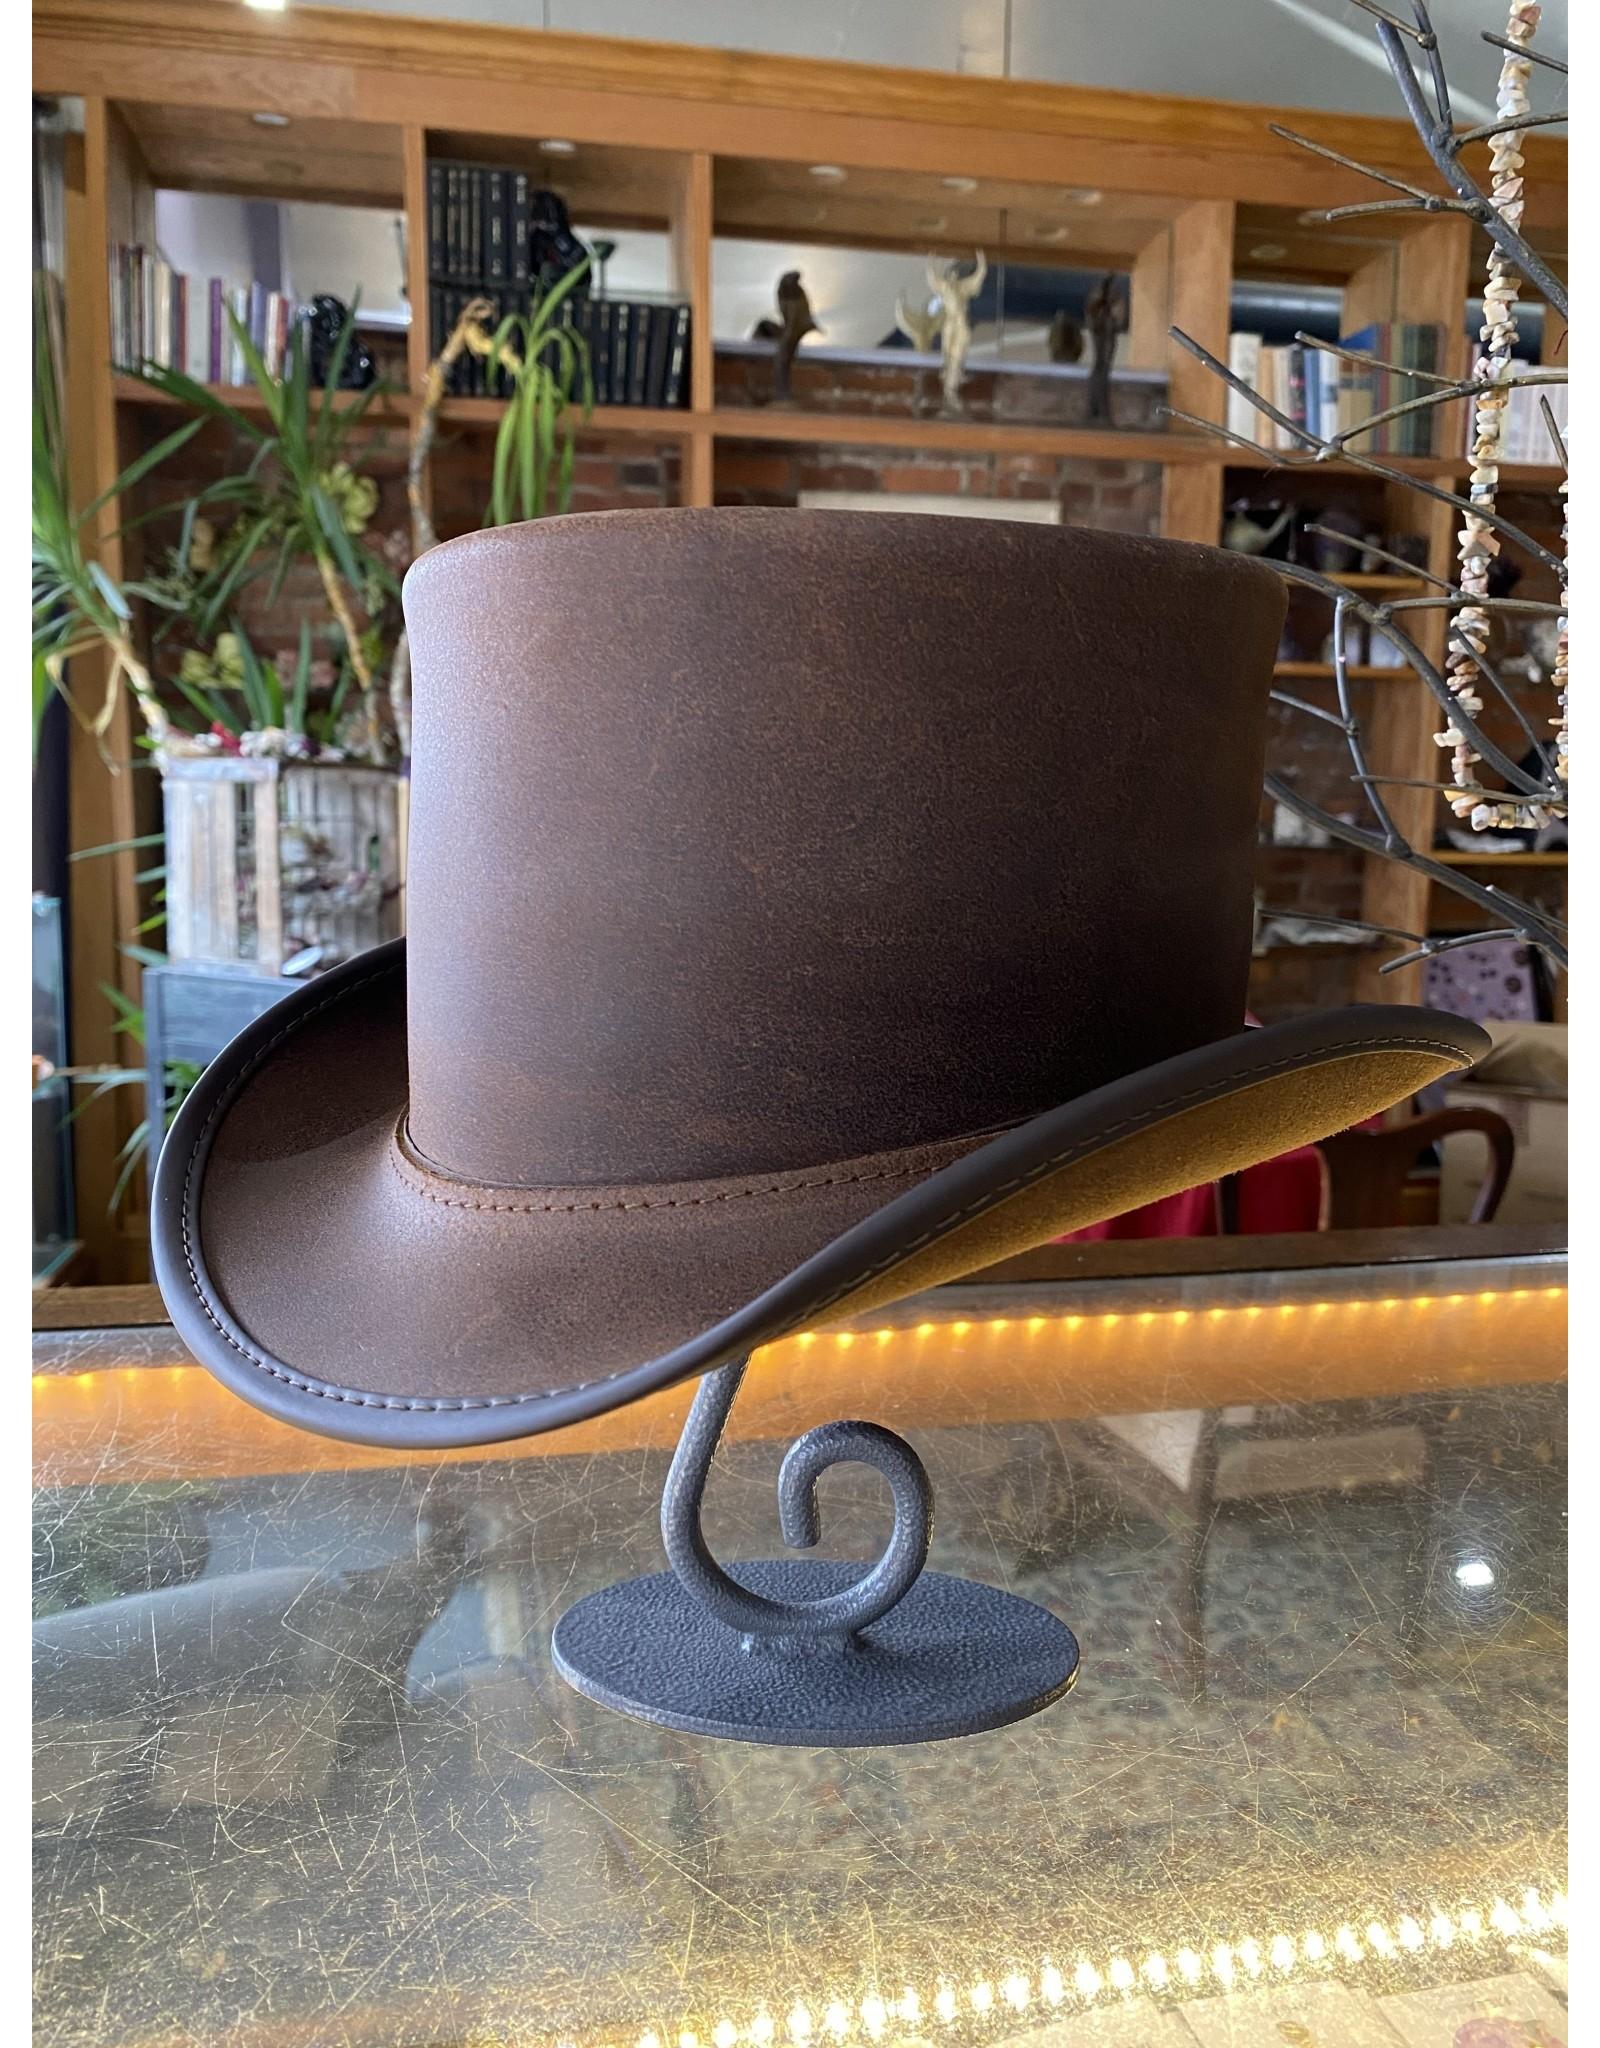 Kilo - Leather - Brown Top Hat - LG